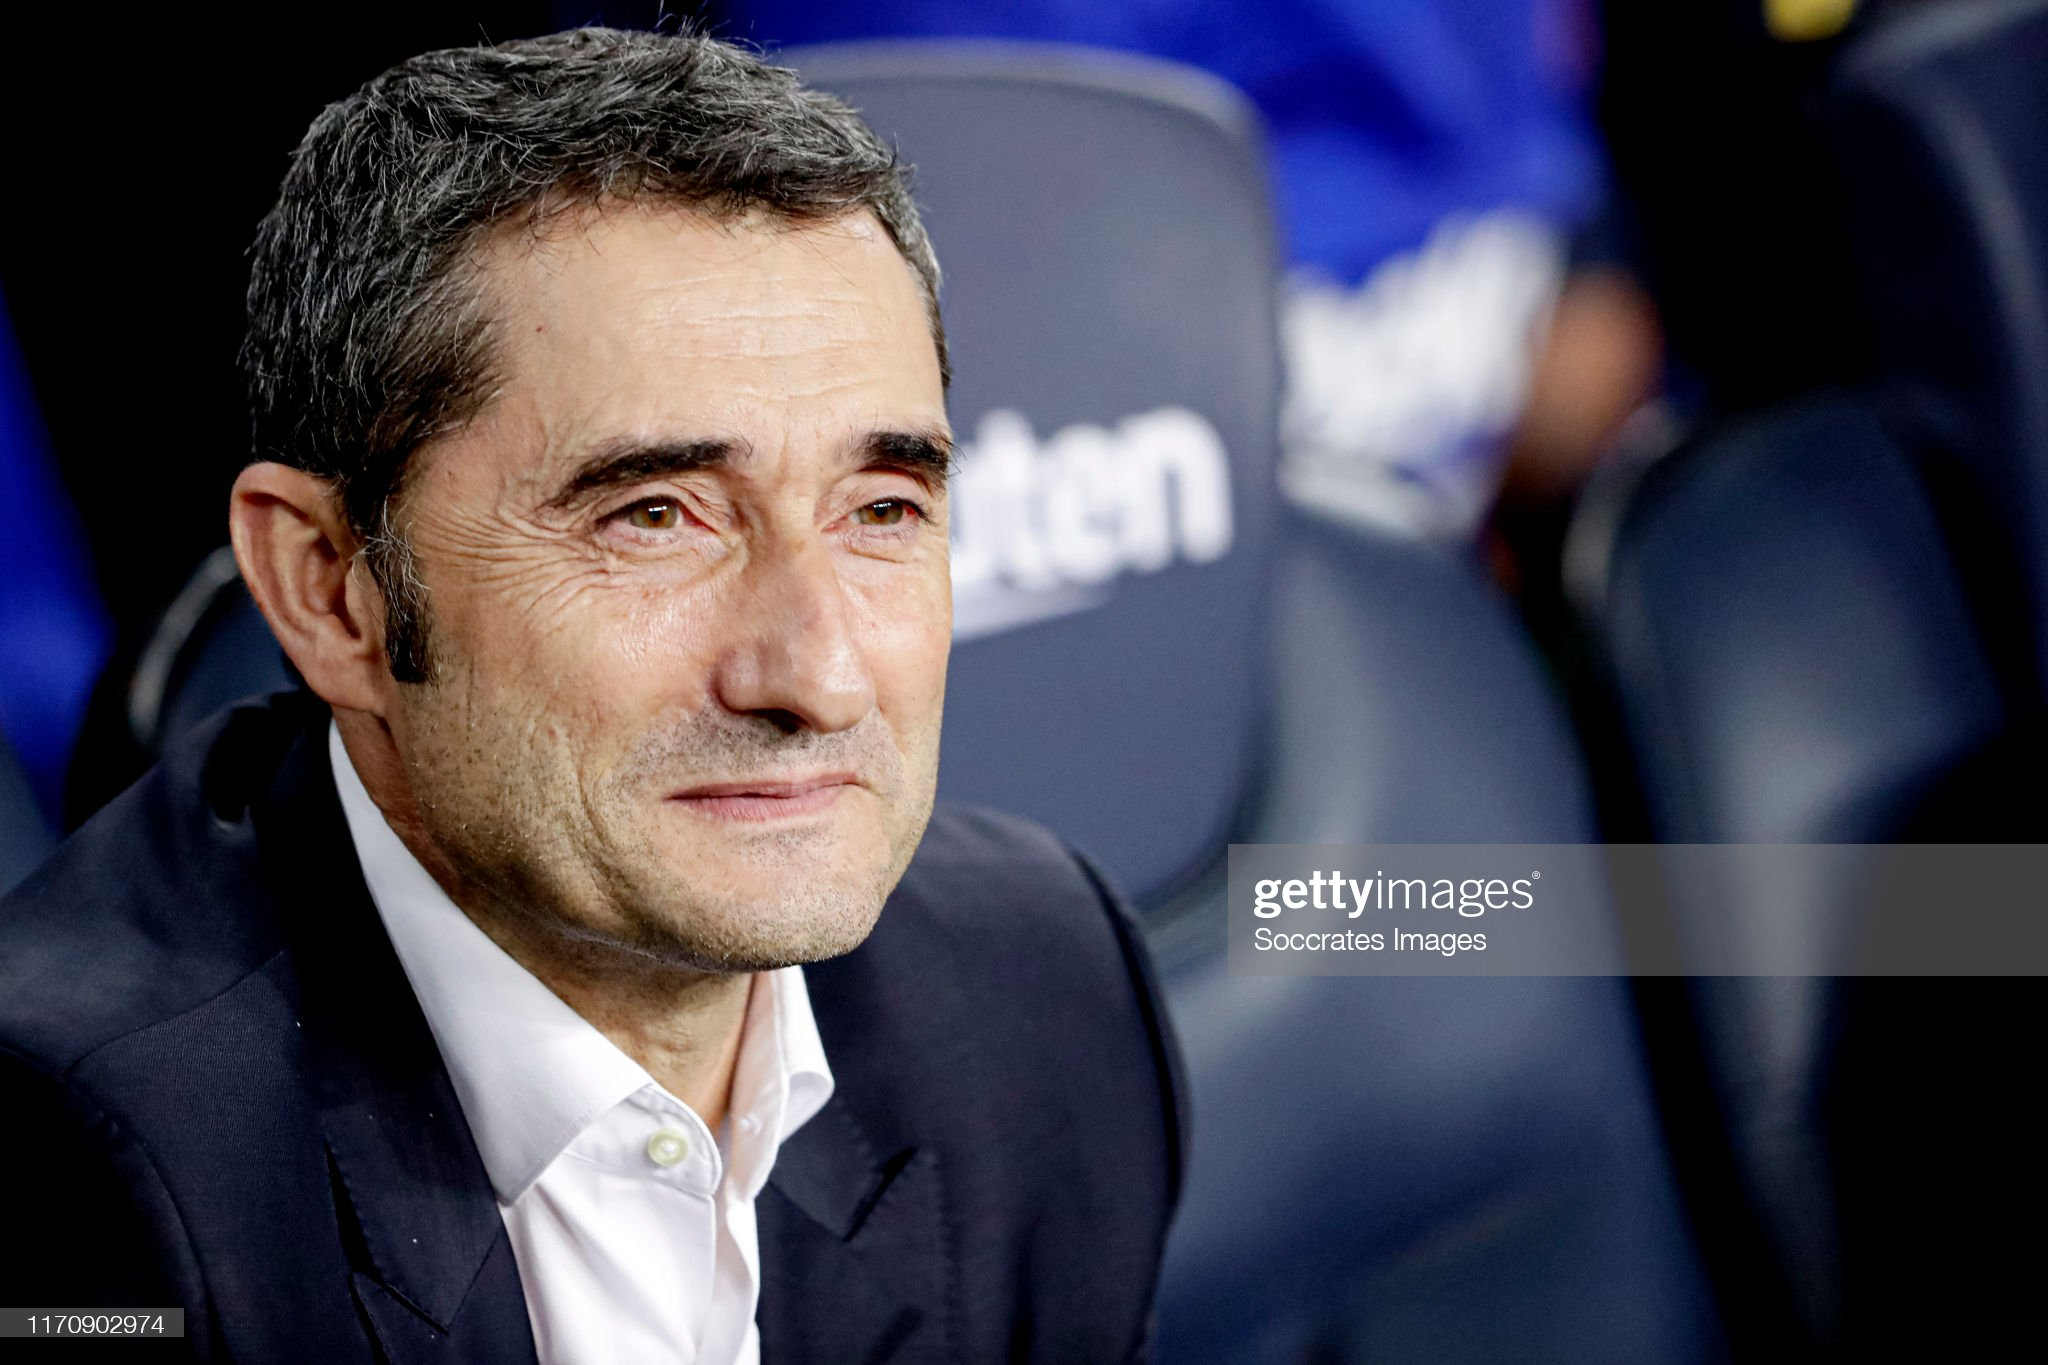 صور مباراة : برشلونة - فياريال 2-1 ( 24-09-2019 )  Coach-ernesto-valverde-of-fc-barcelona-during-the-la-liga-santander-picture-id1170902974?s=2048x2048